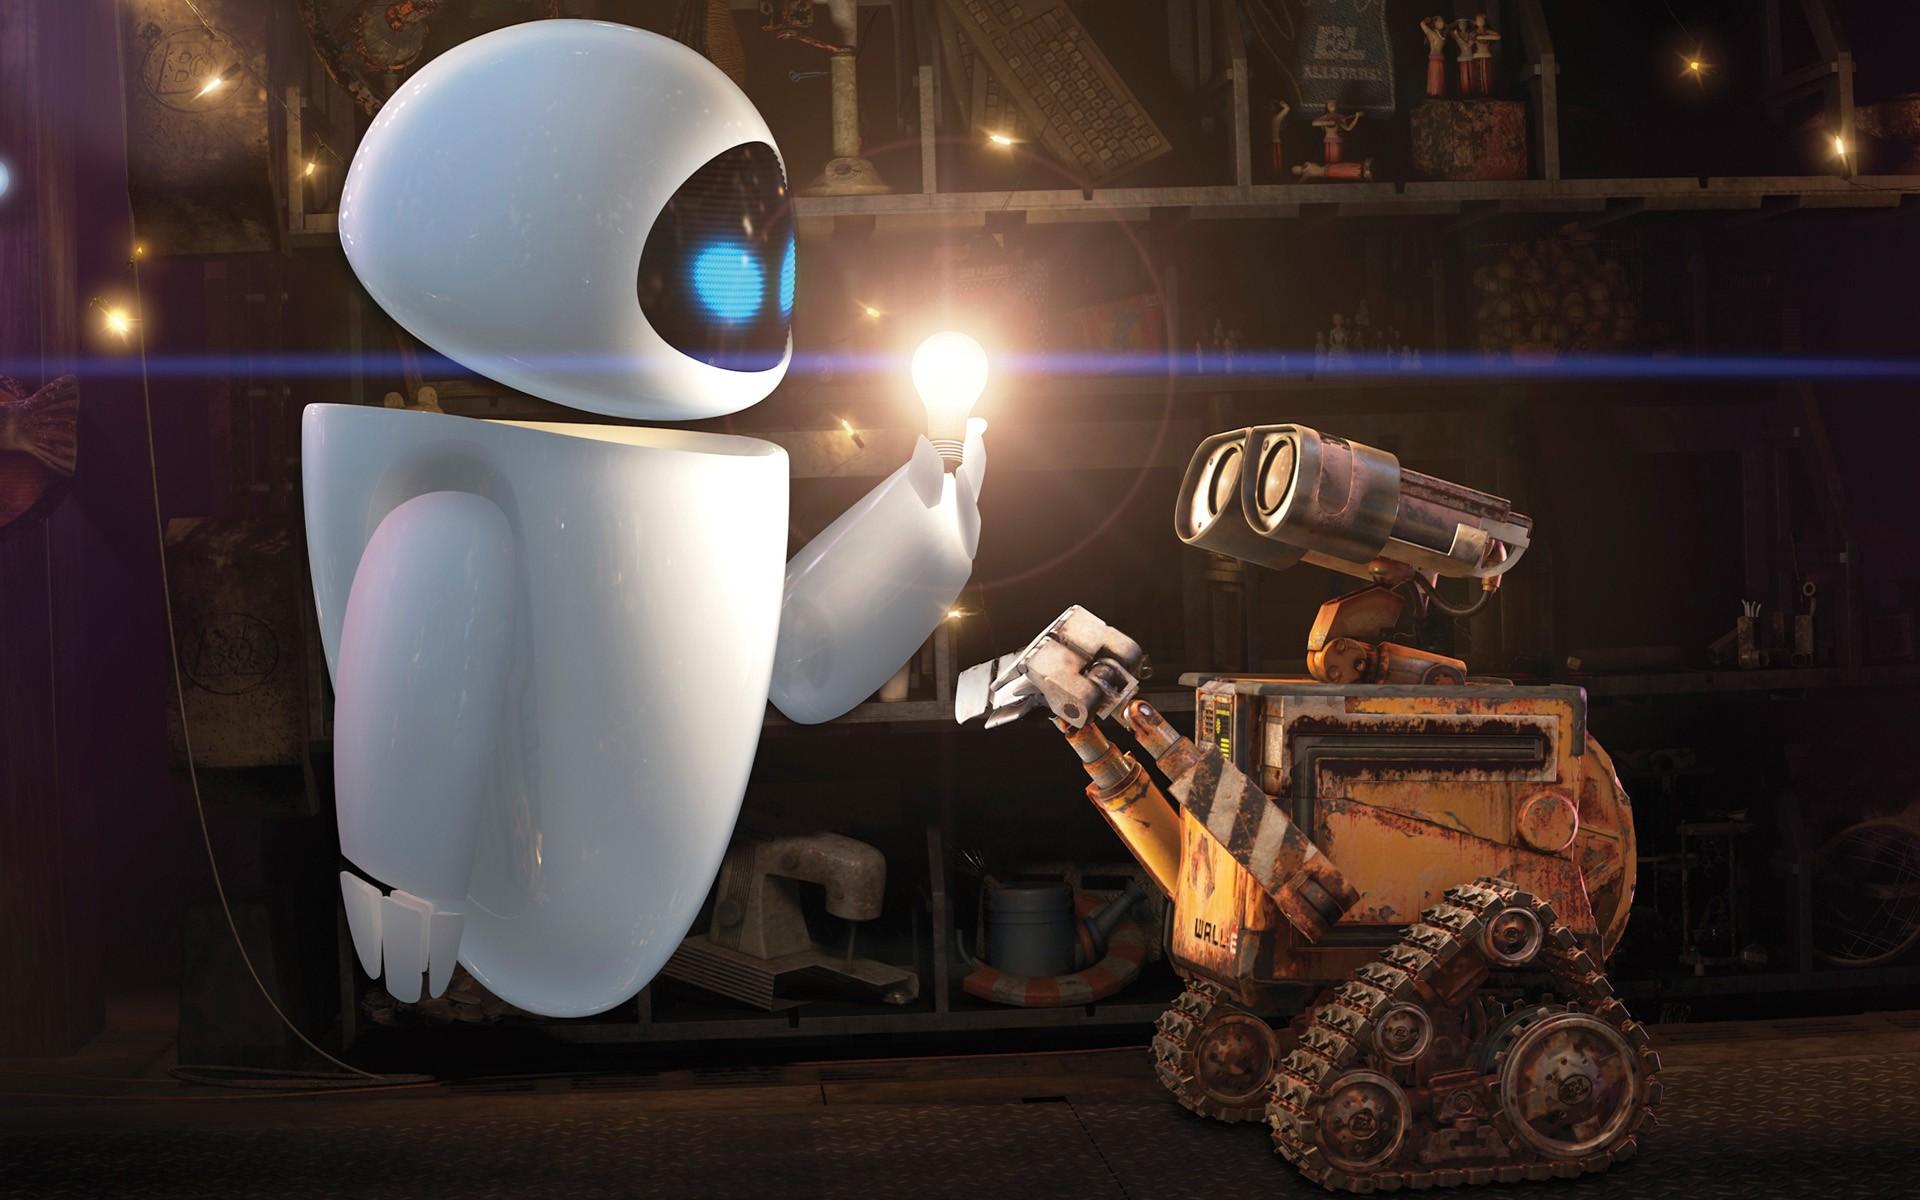 General 1920x1200 Pixar Animation Studios Disney Pixar WALL-E